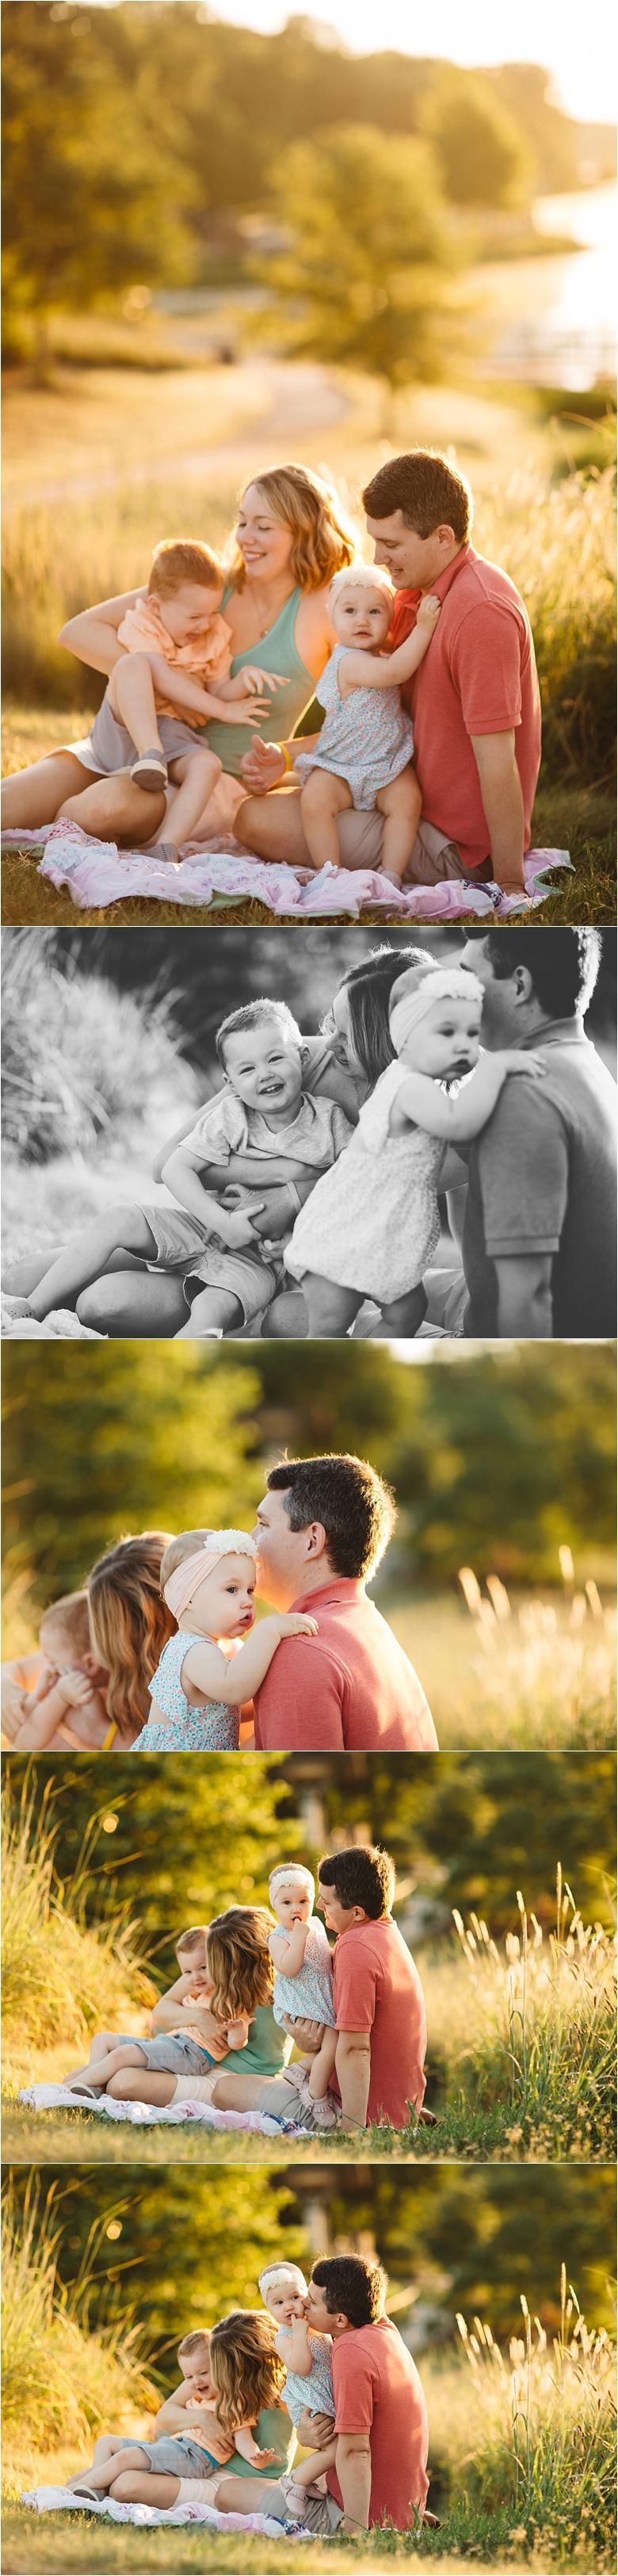 kansascityfamilyphotographer_0068